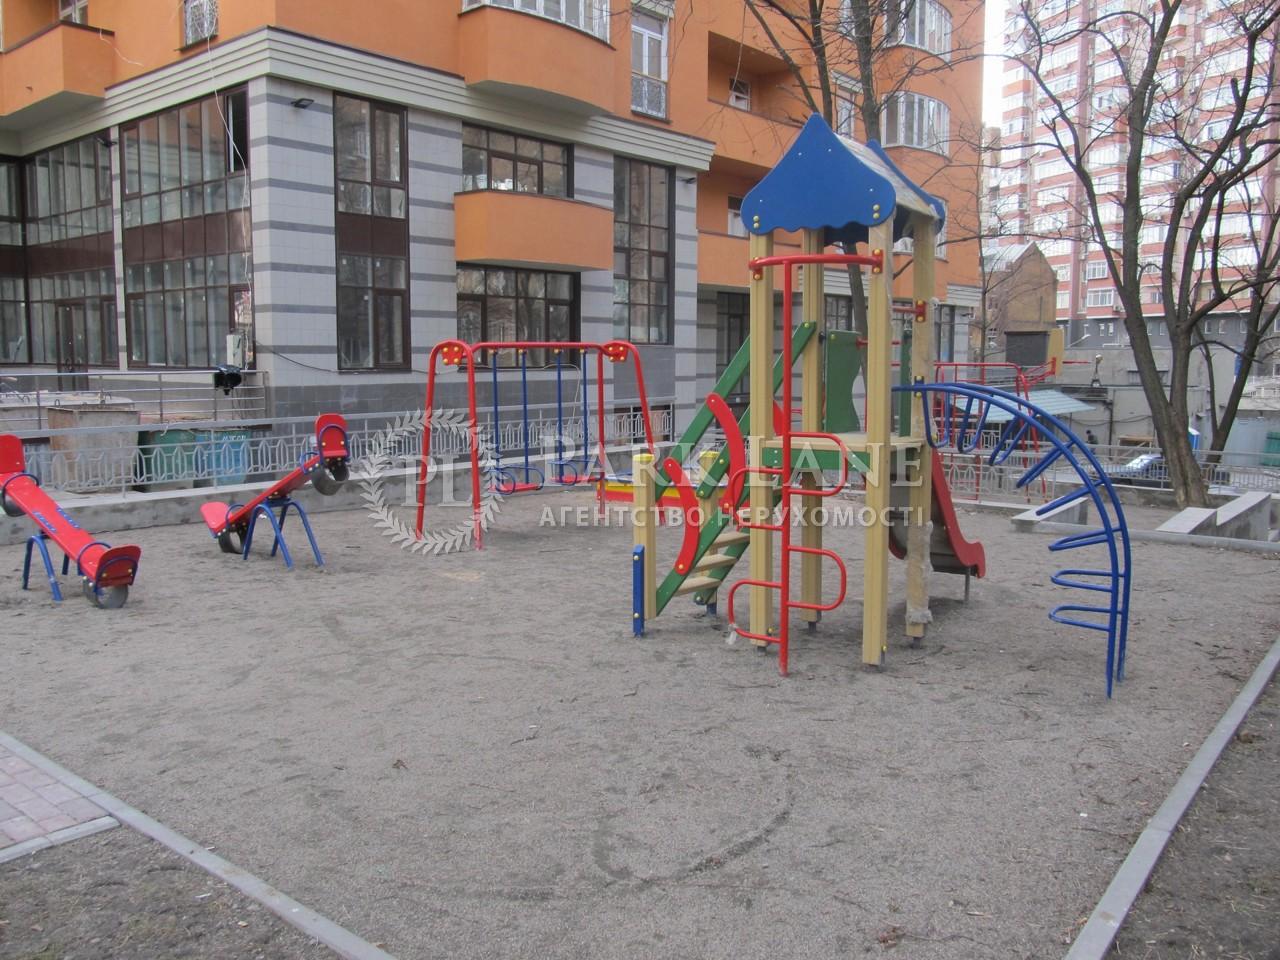 Квартира ул. Златоустовская, 47-49, Киев, J-30794 - Фото 3